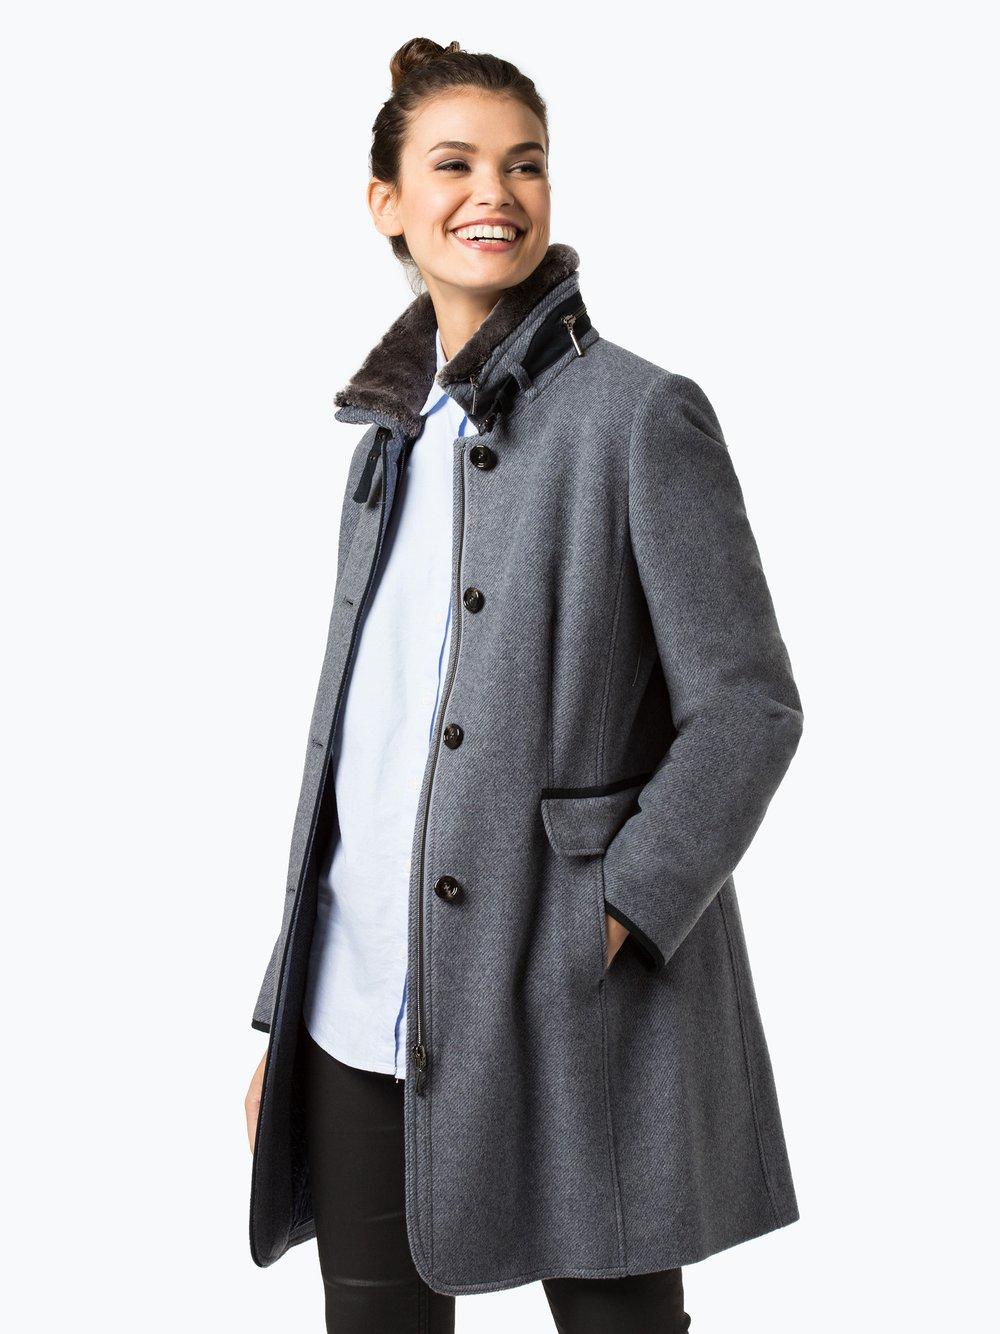 Gil Bret Damen Mantel online kaufen | VANGRAAF.COM